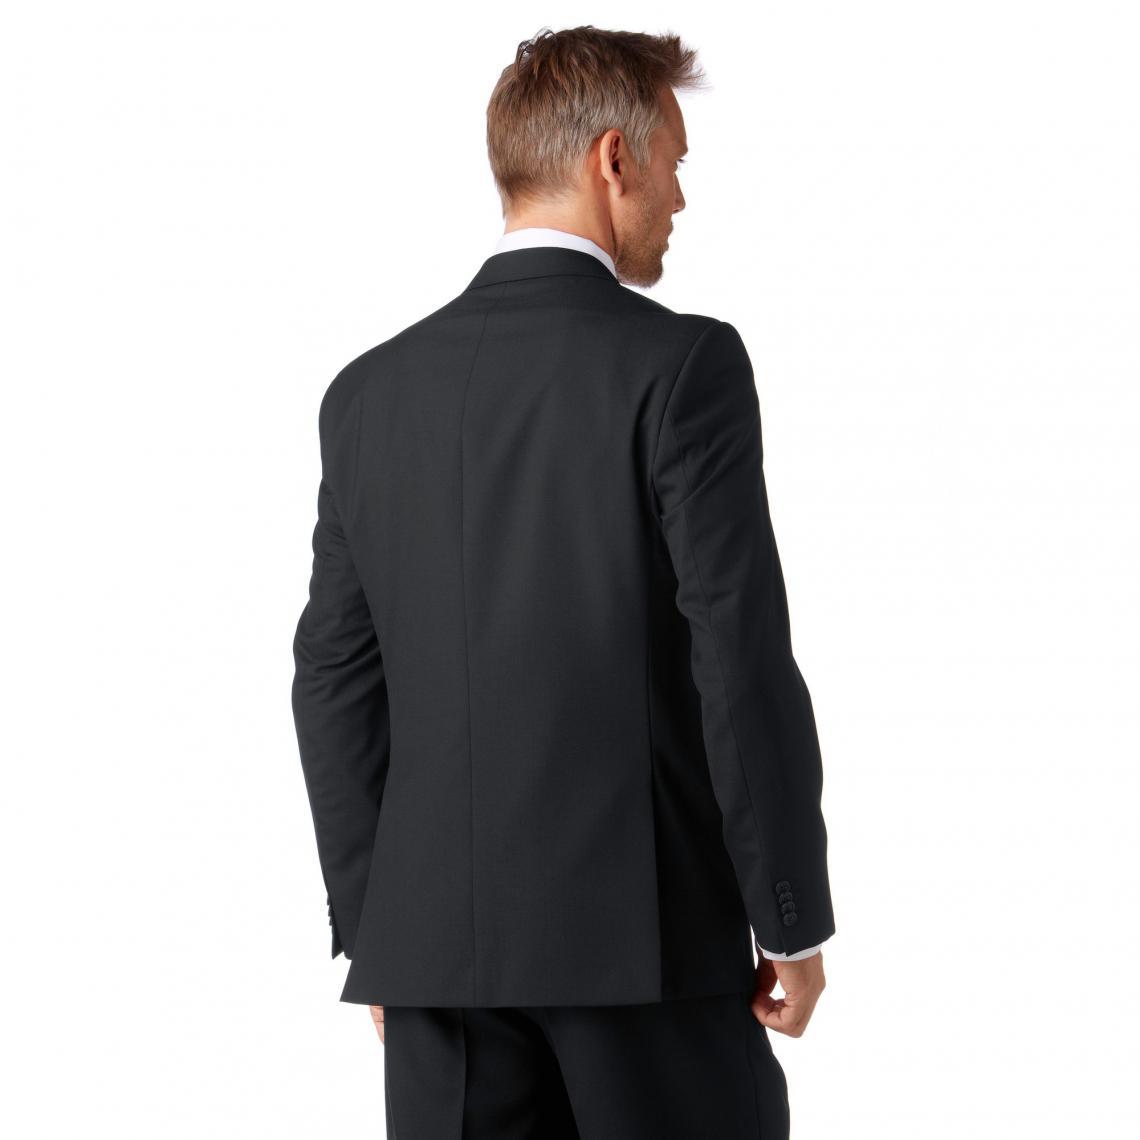 Noir International Polyester Et Costume De Class Veste Homme Laine Zf86xtwg f03cd9587e2